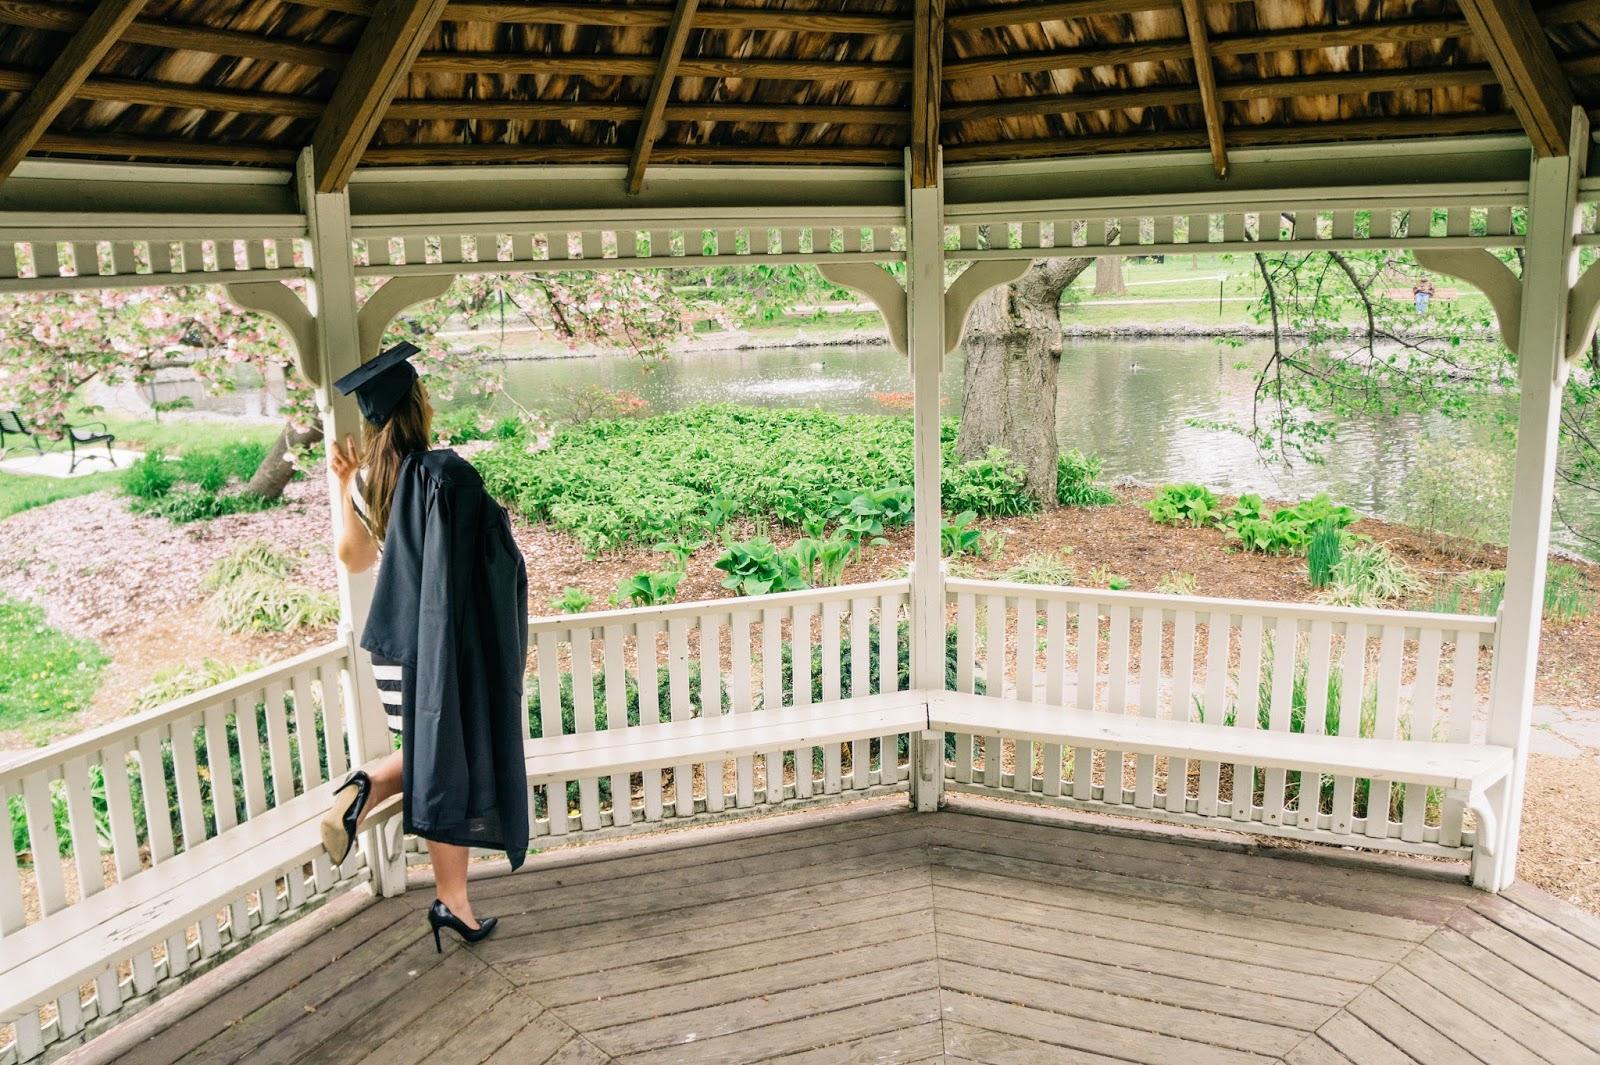 Graduate in a gazebo overlooking a pond.